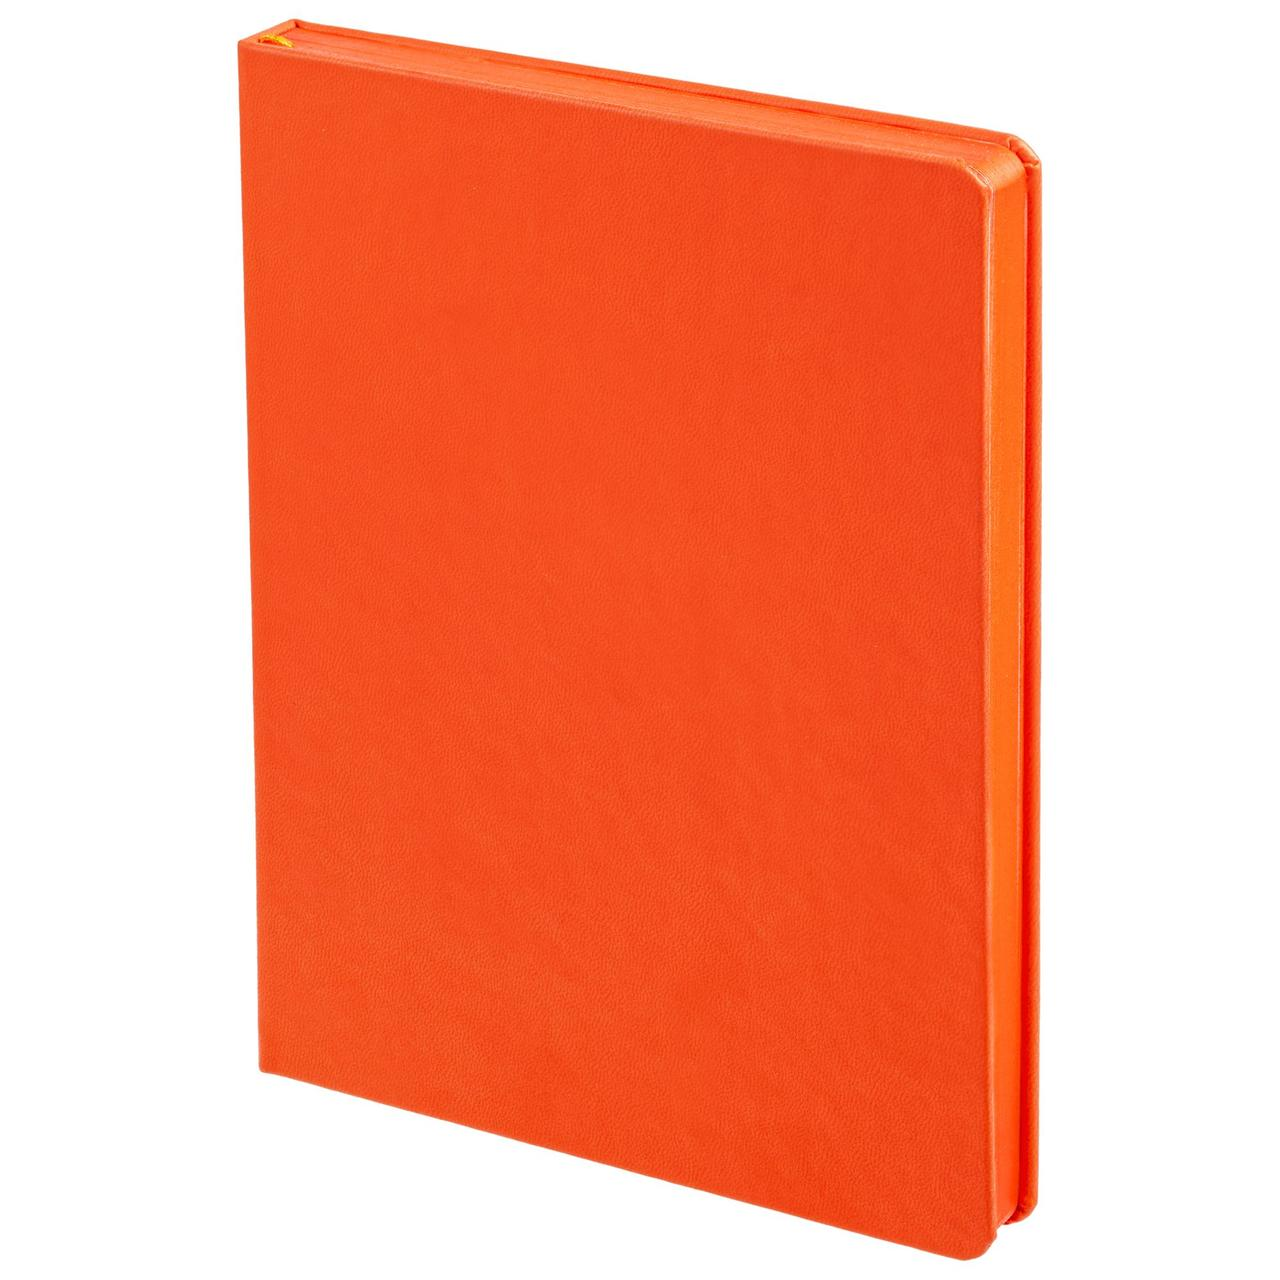 Ежедневник Brand Tone, недатированный, оранжевый (артикул 17882.20)